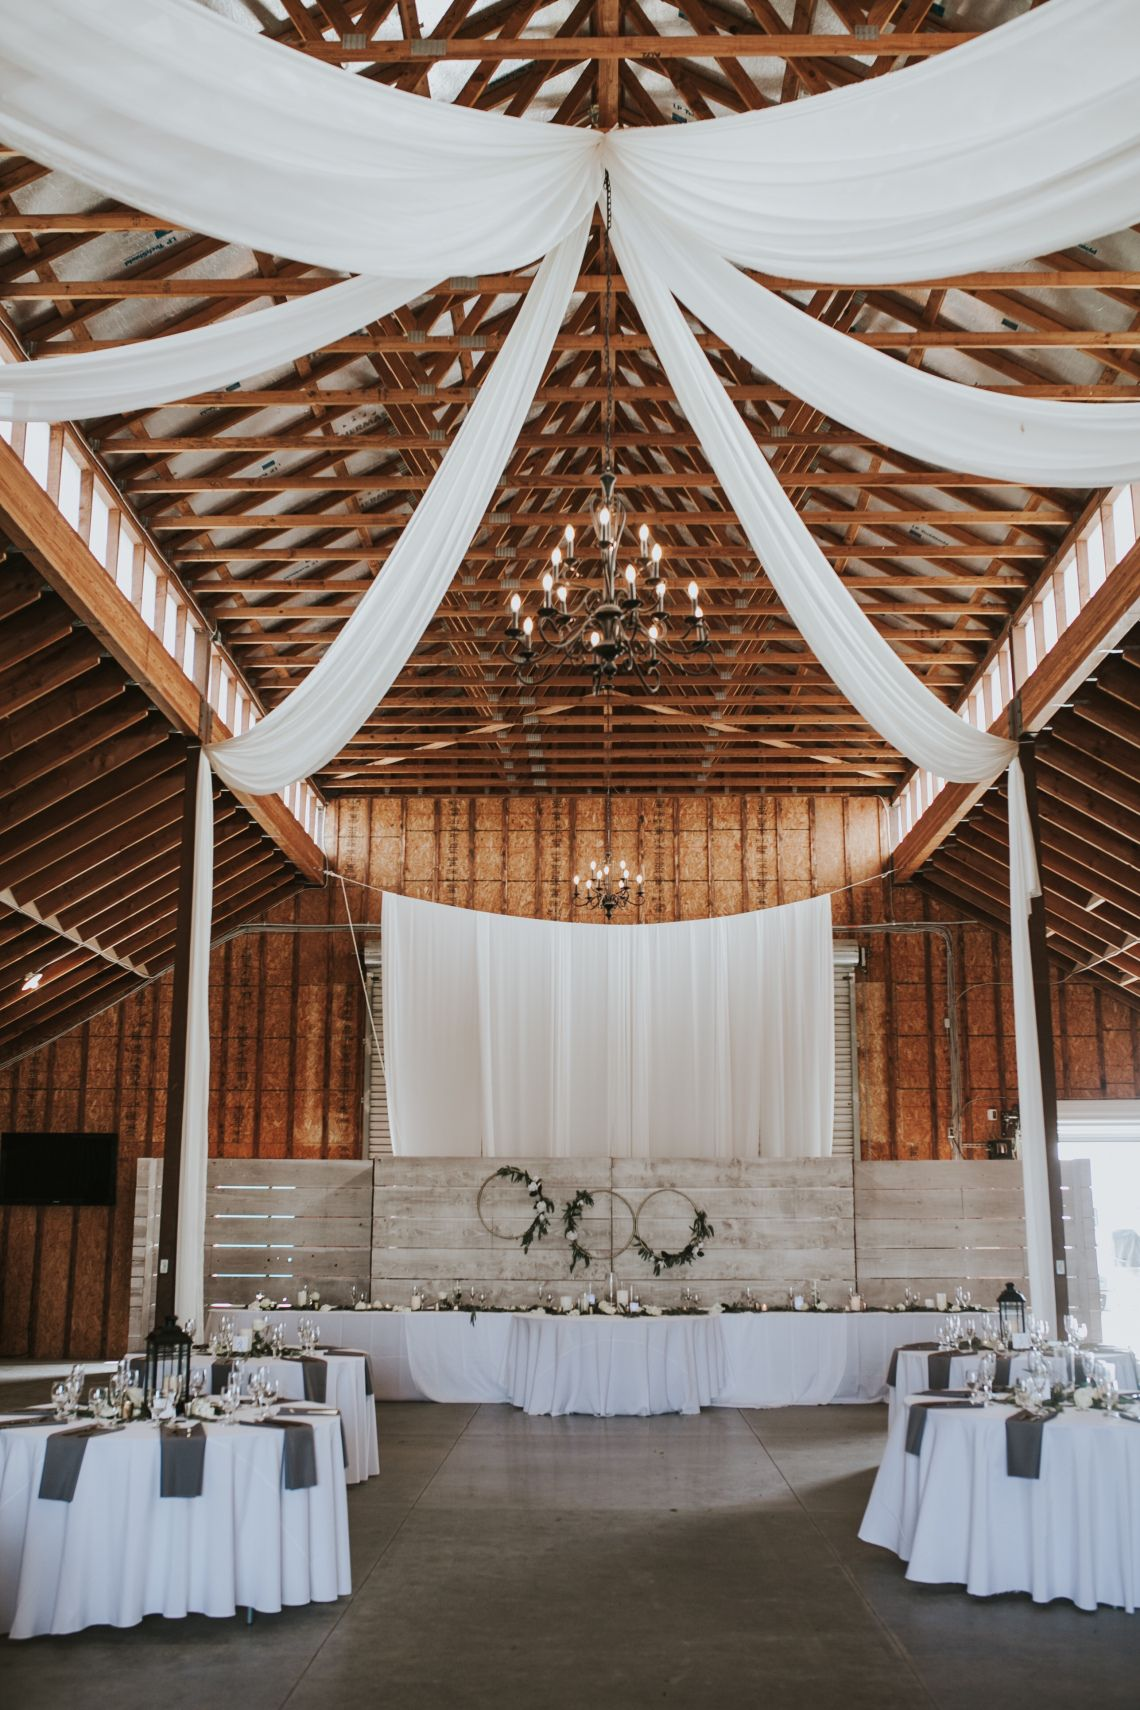 Barn wedding modern rustic with draping | Wedding modern ...